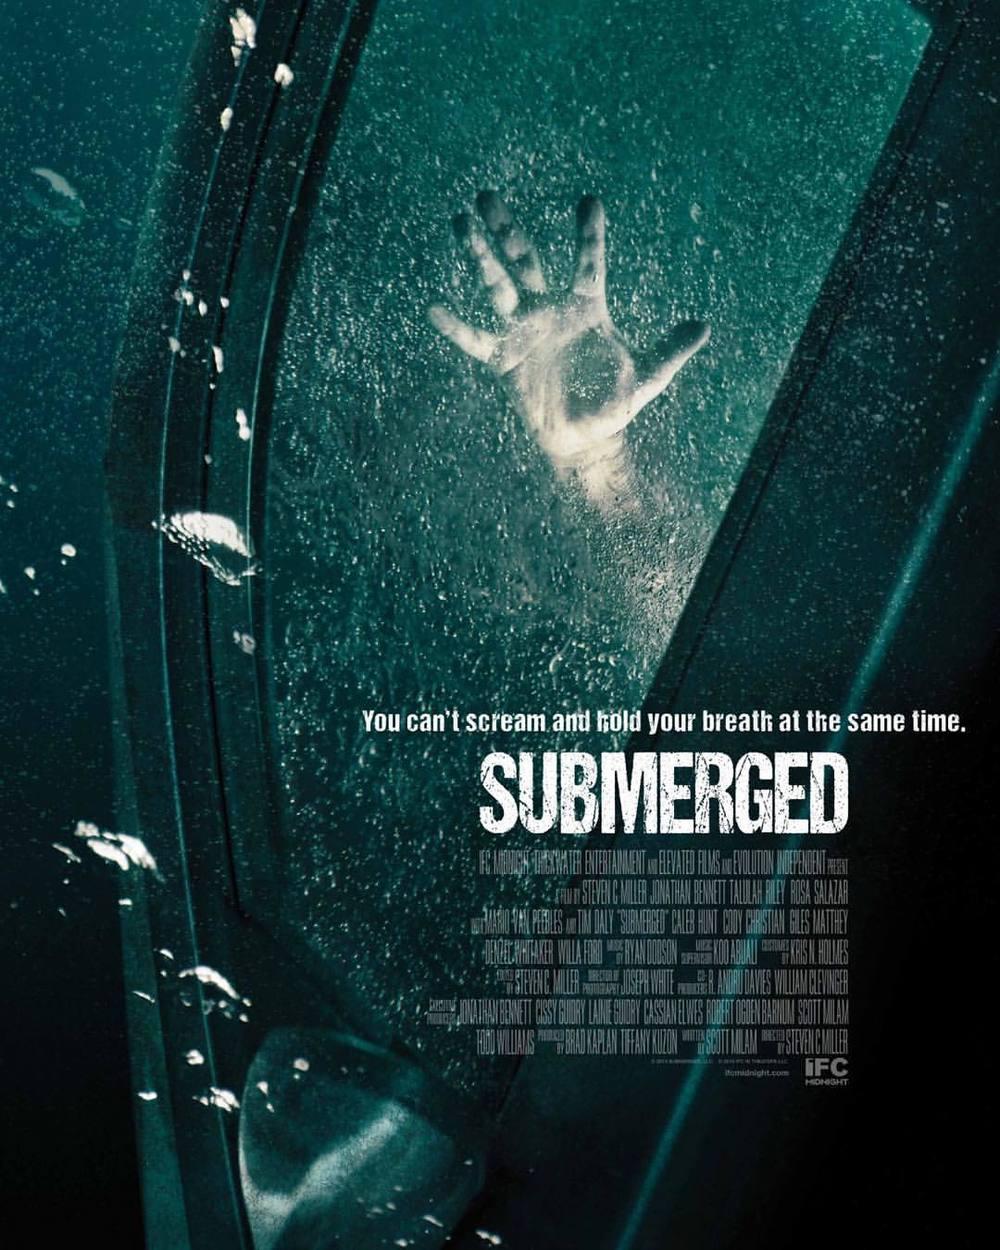 Submerged_IFC_Poster.jpg